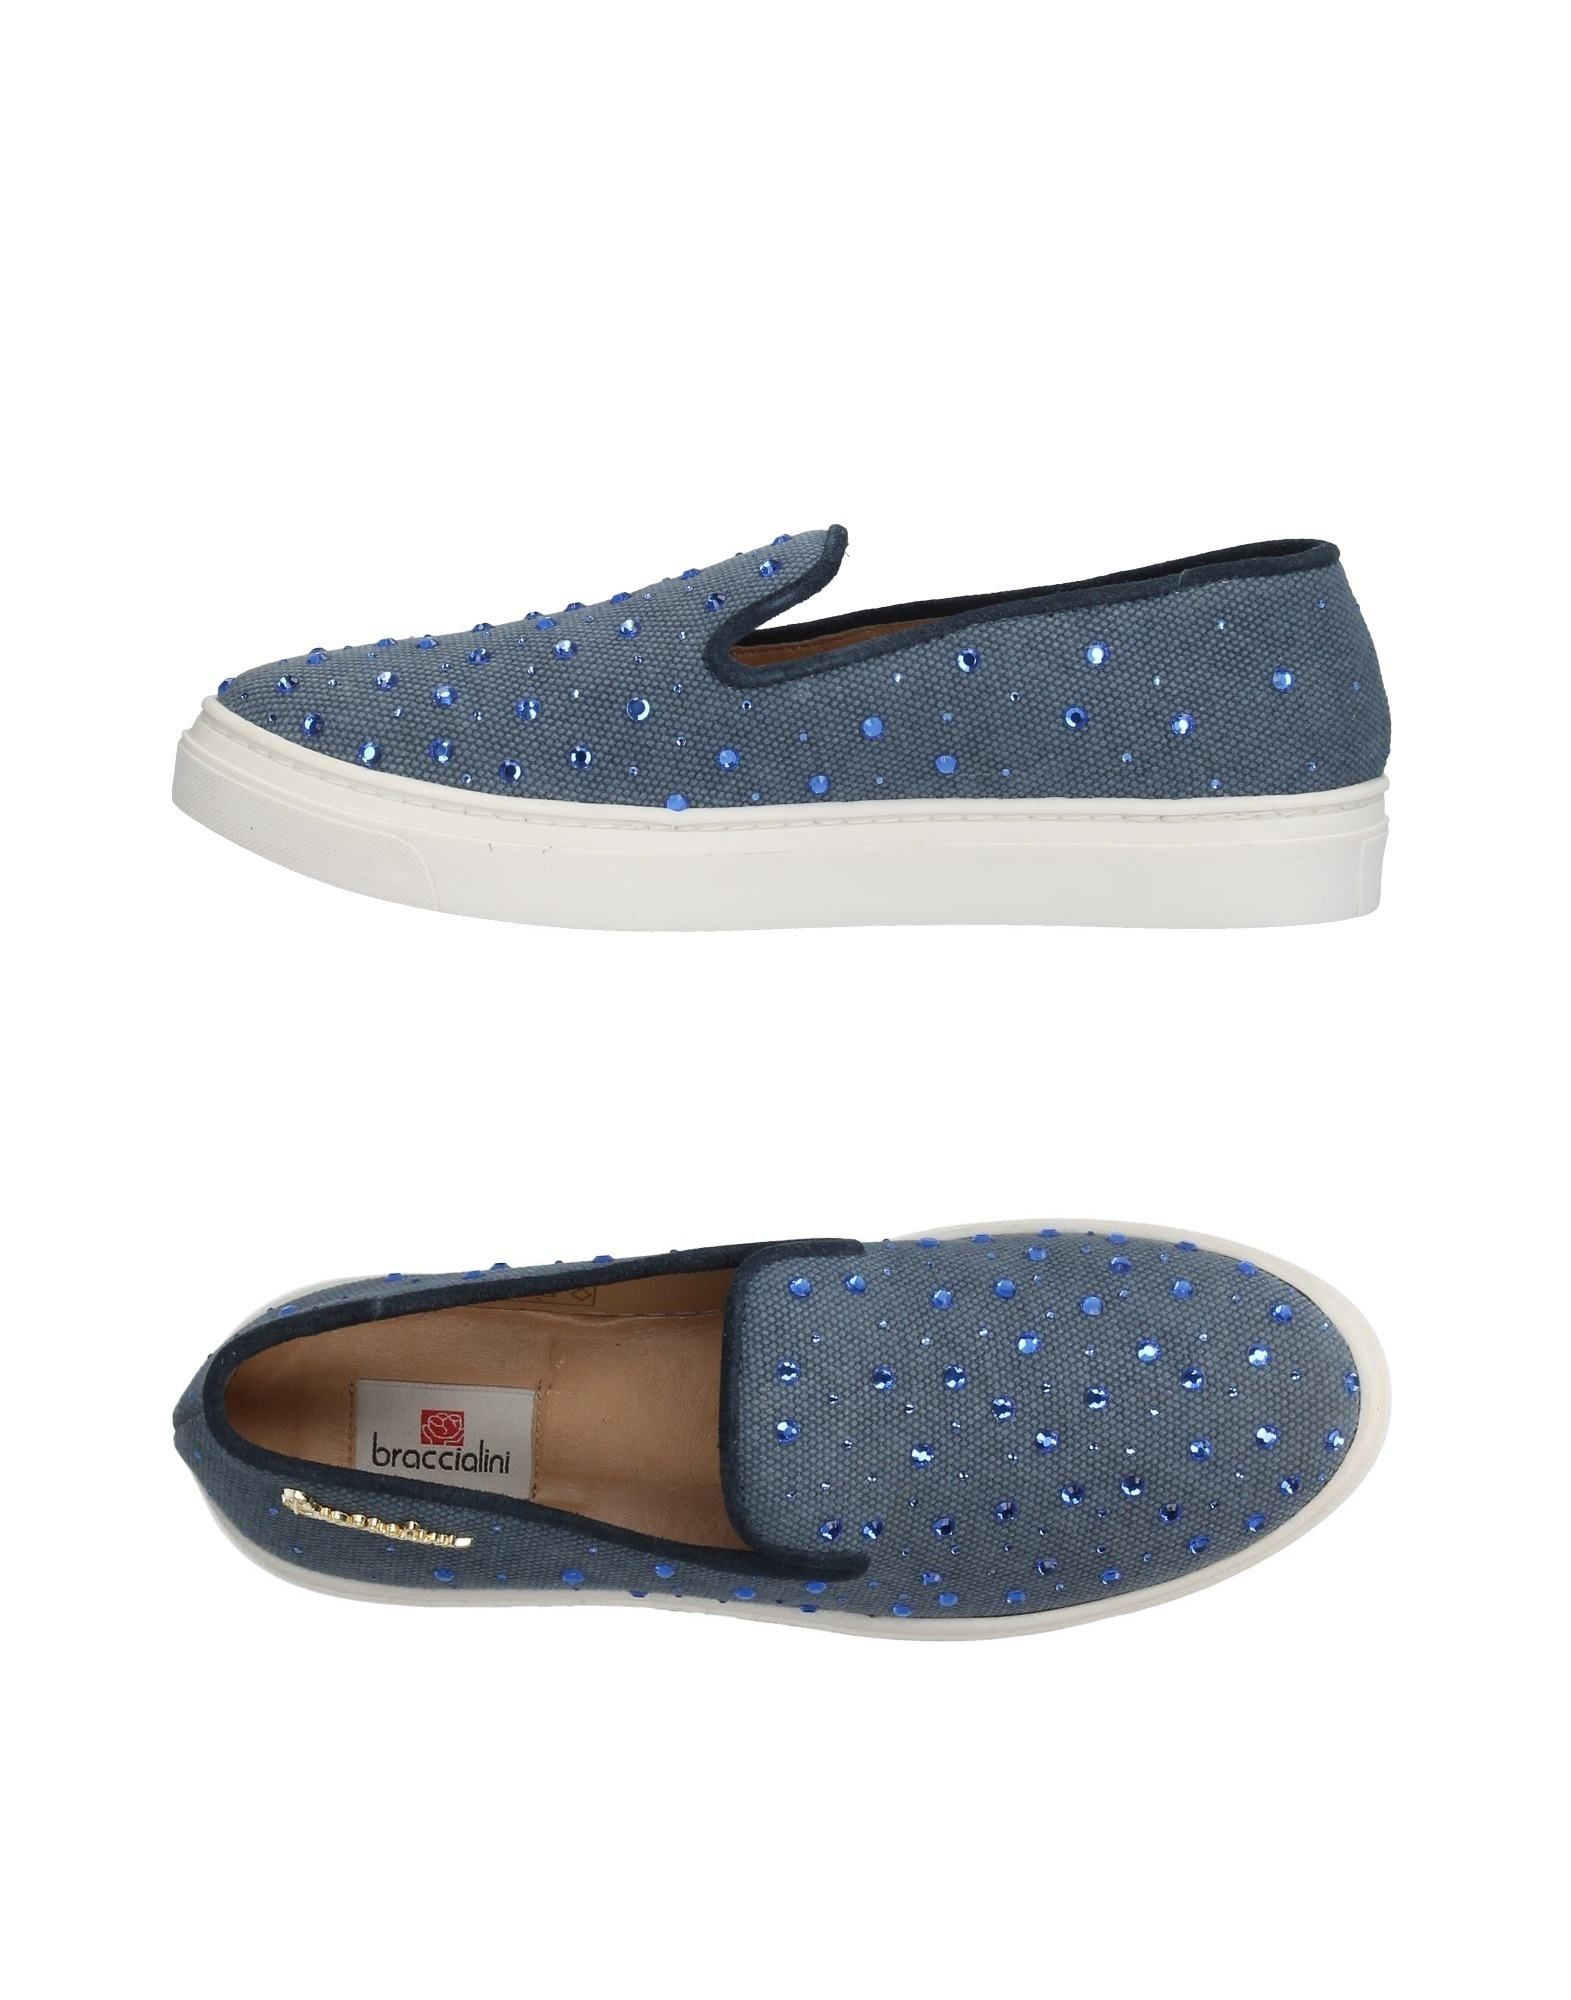 Moda Sneakers Braccialini Donna - 11197133AS